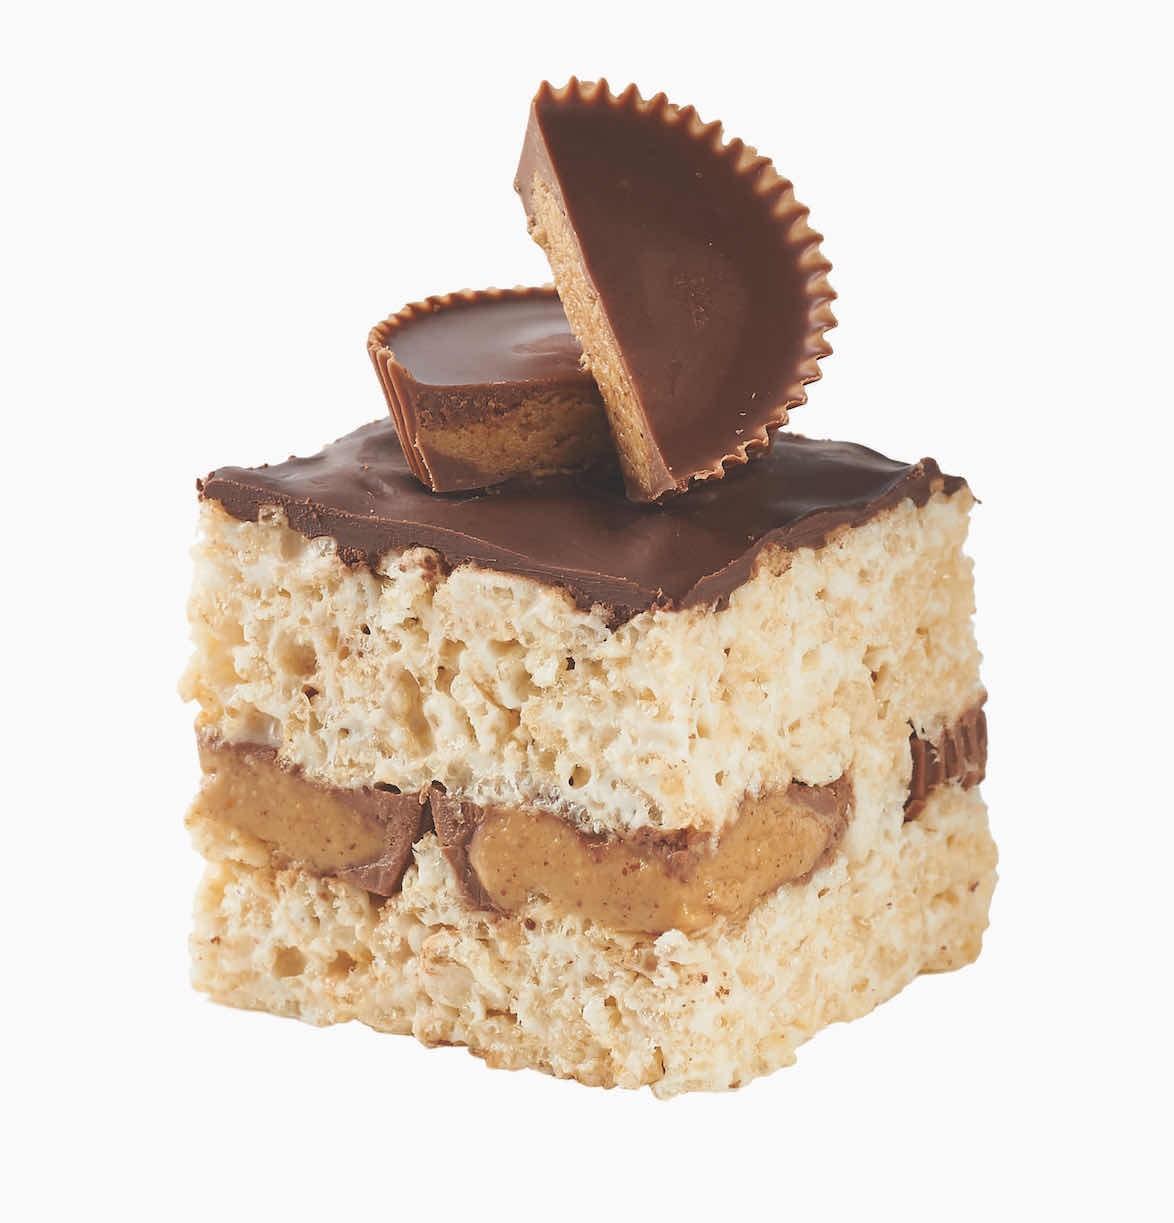 Peanut Butter Cup Filled Rice Crispy Bar